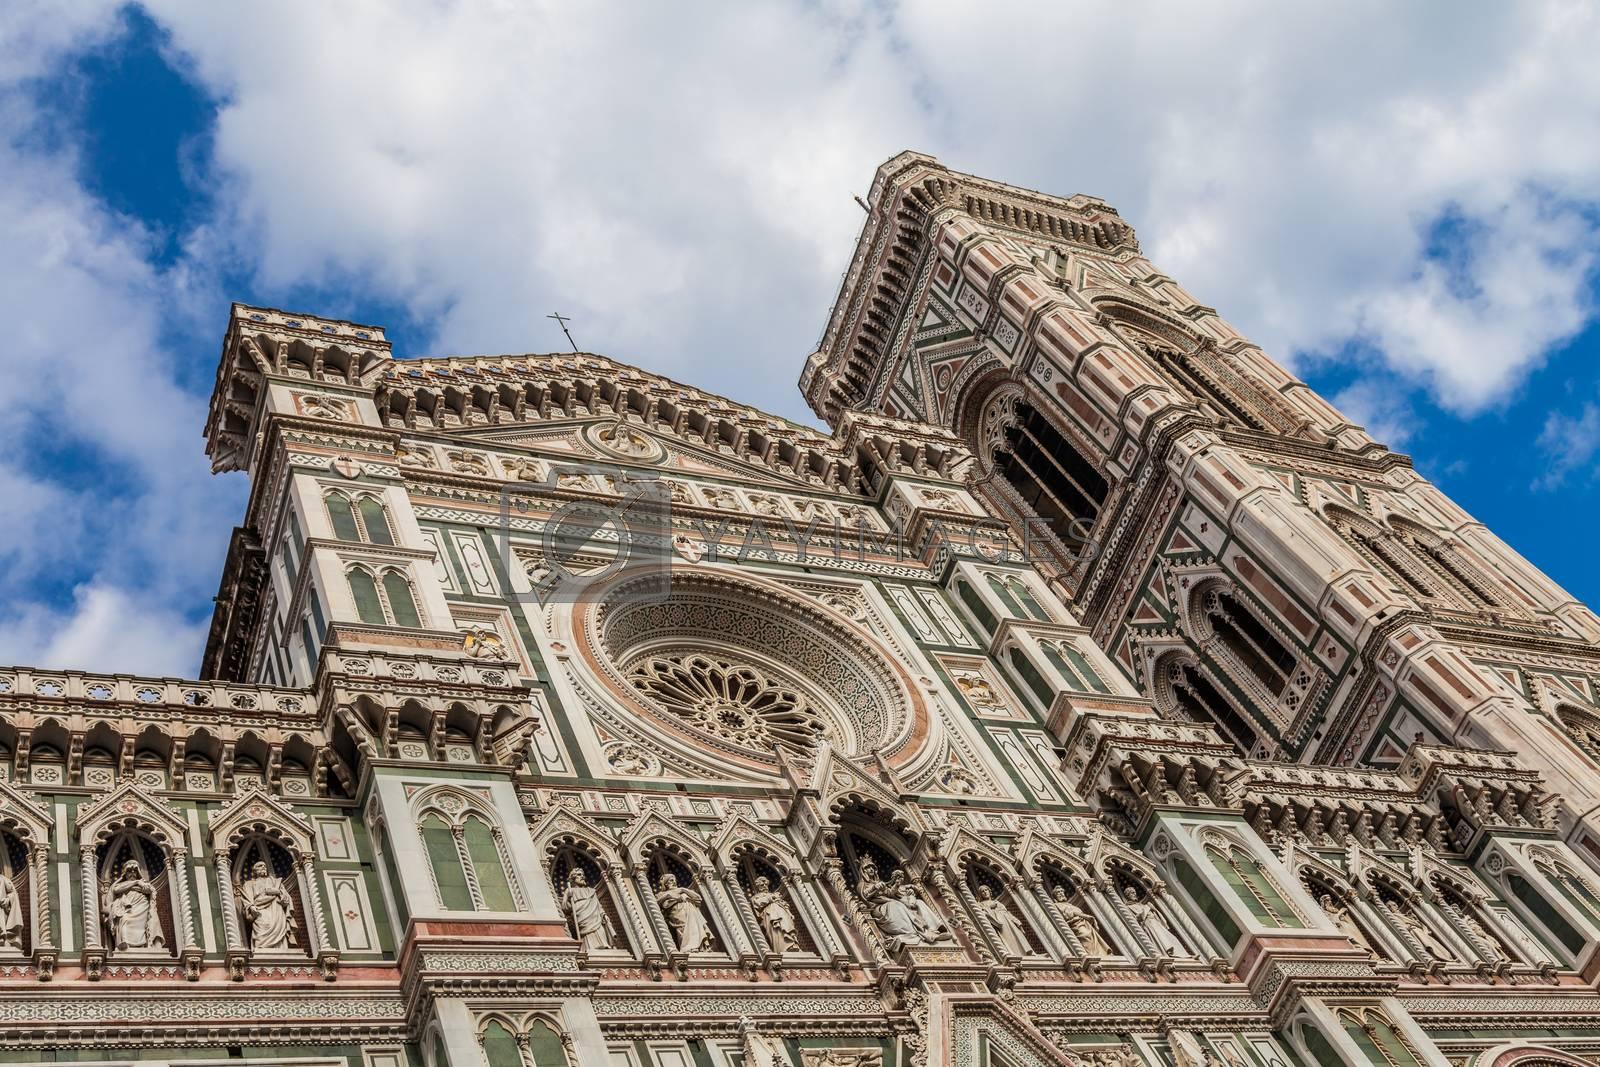 Duomo di Firenze by Perseomedusa